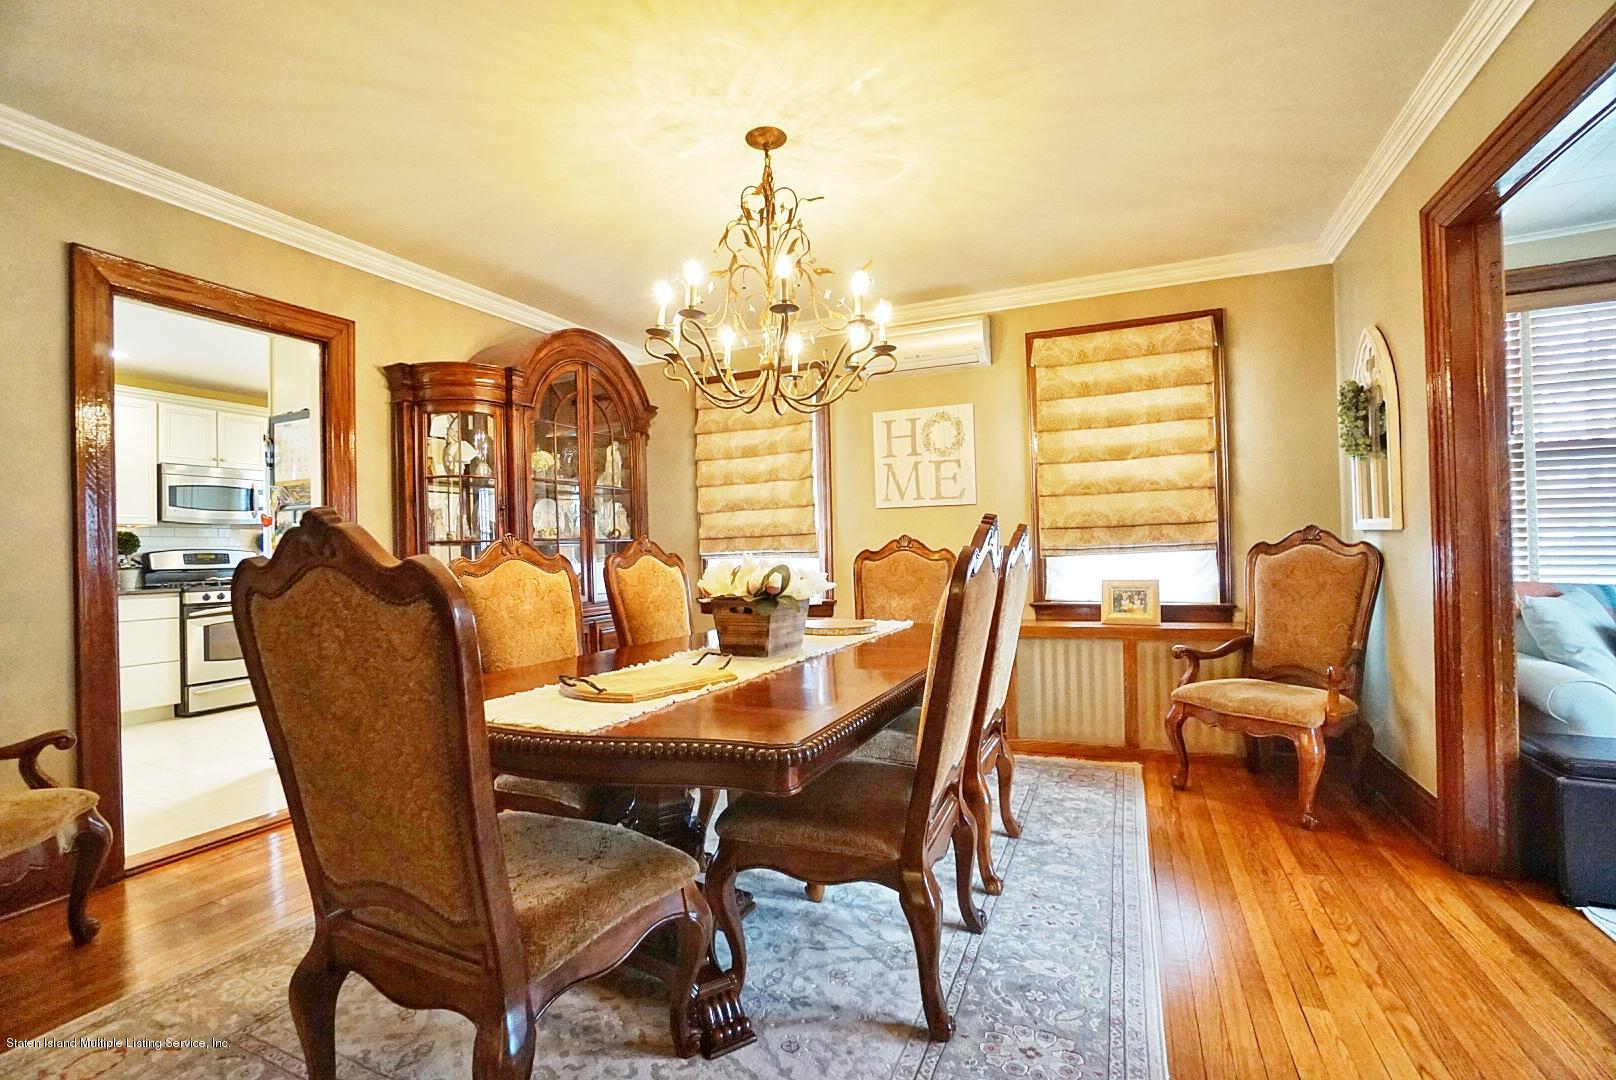 Single Family - Detached 171 Keiber Court  Staten Island, NY 10314, MLS-1127425-21